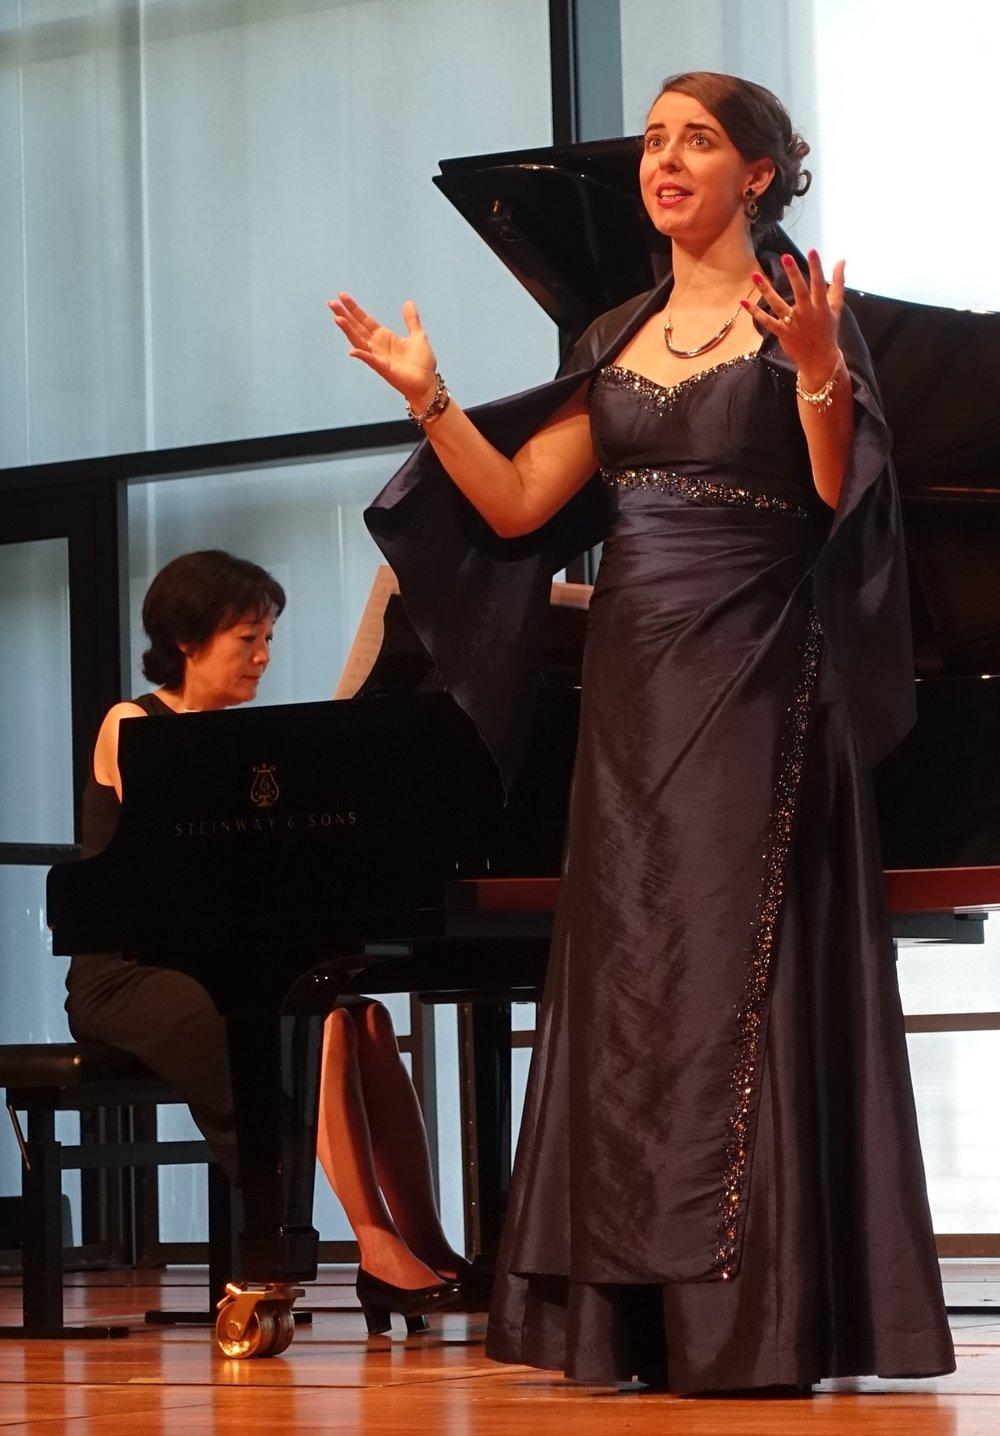 Liedrecital - Mozarteum Salzburg - juni 2017 - © Tamara Duijvestijn